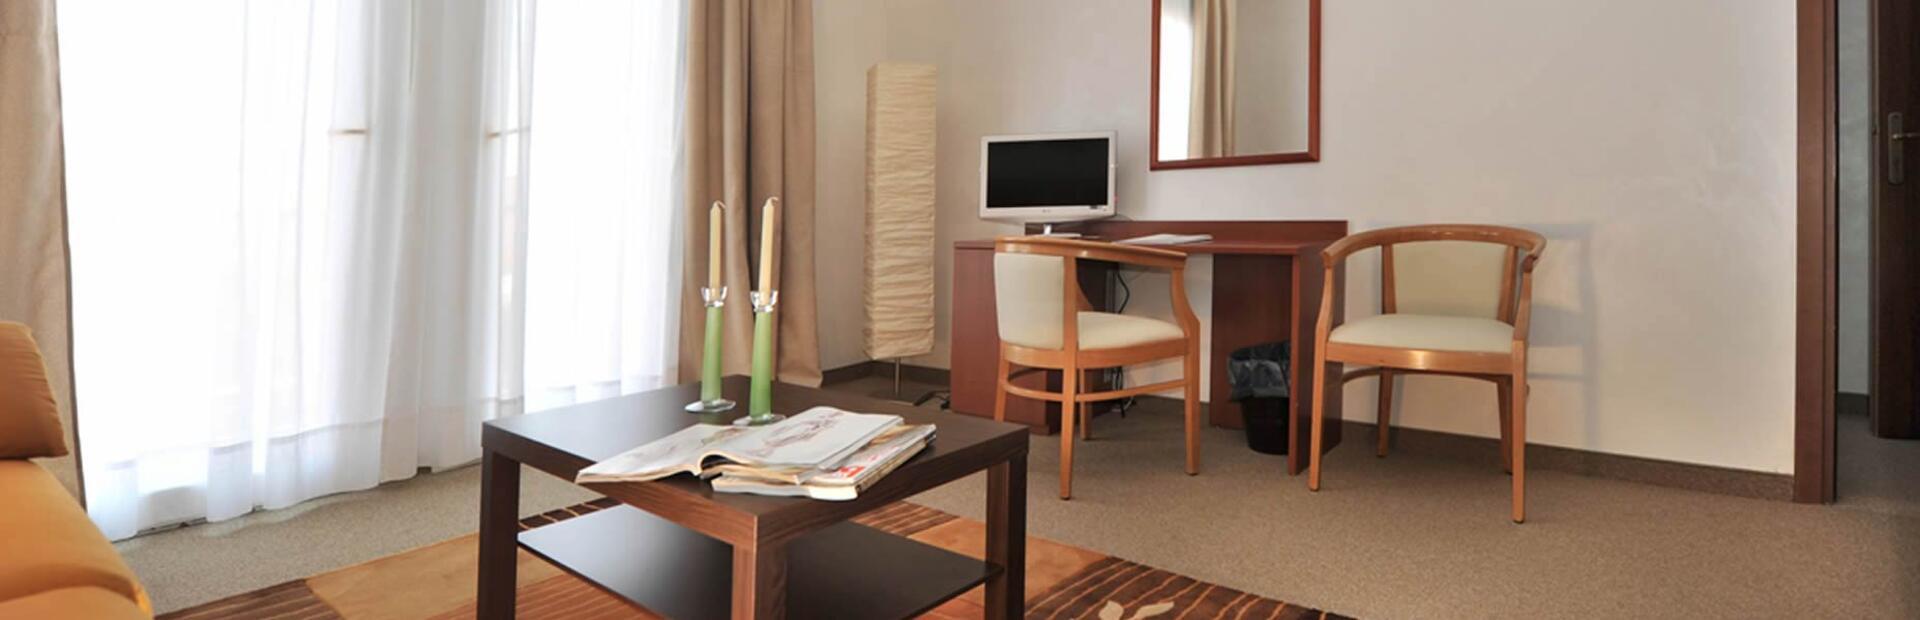 hotel-sole de junior-suite 001